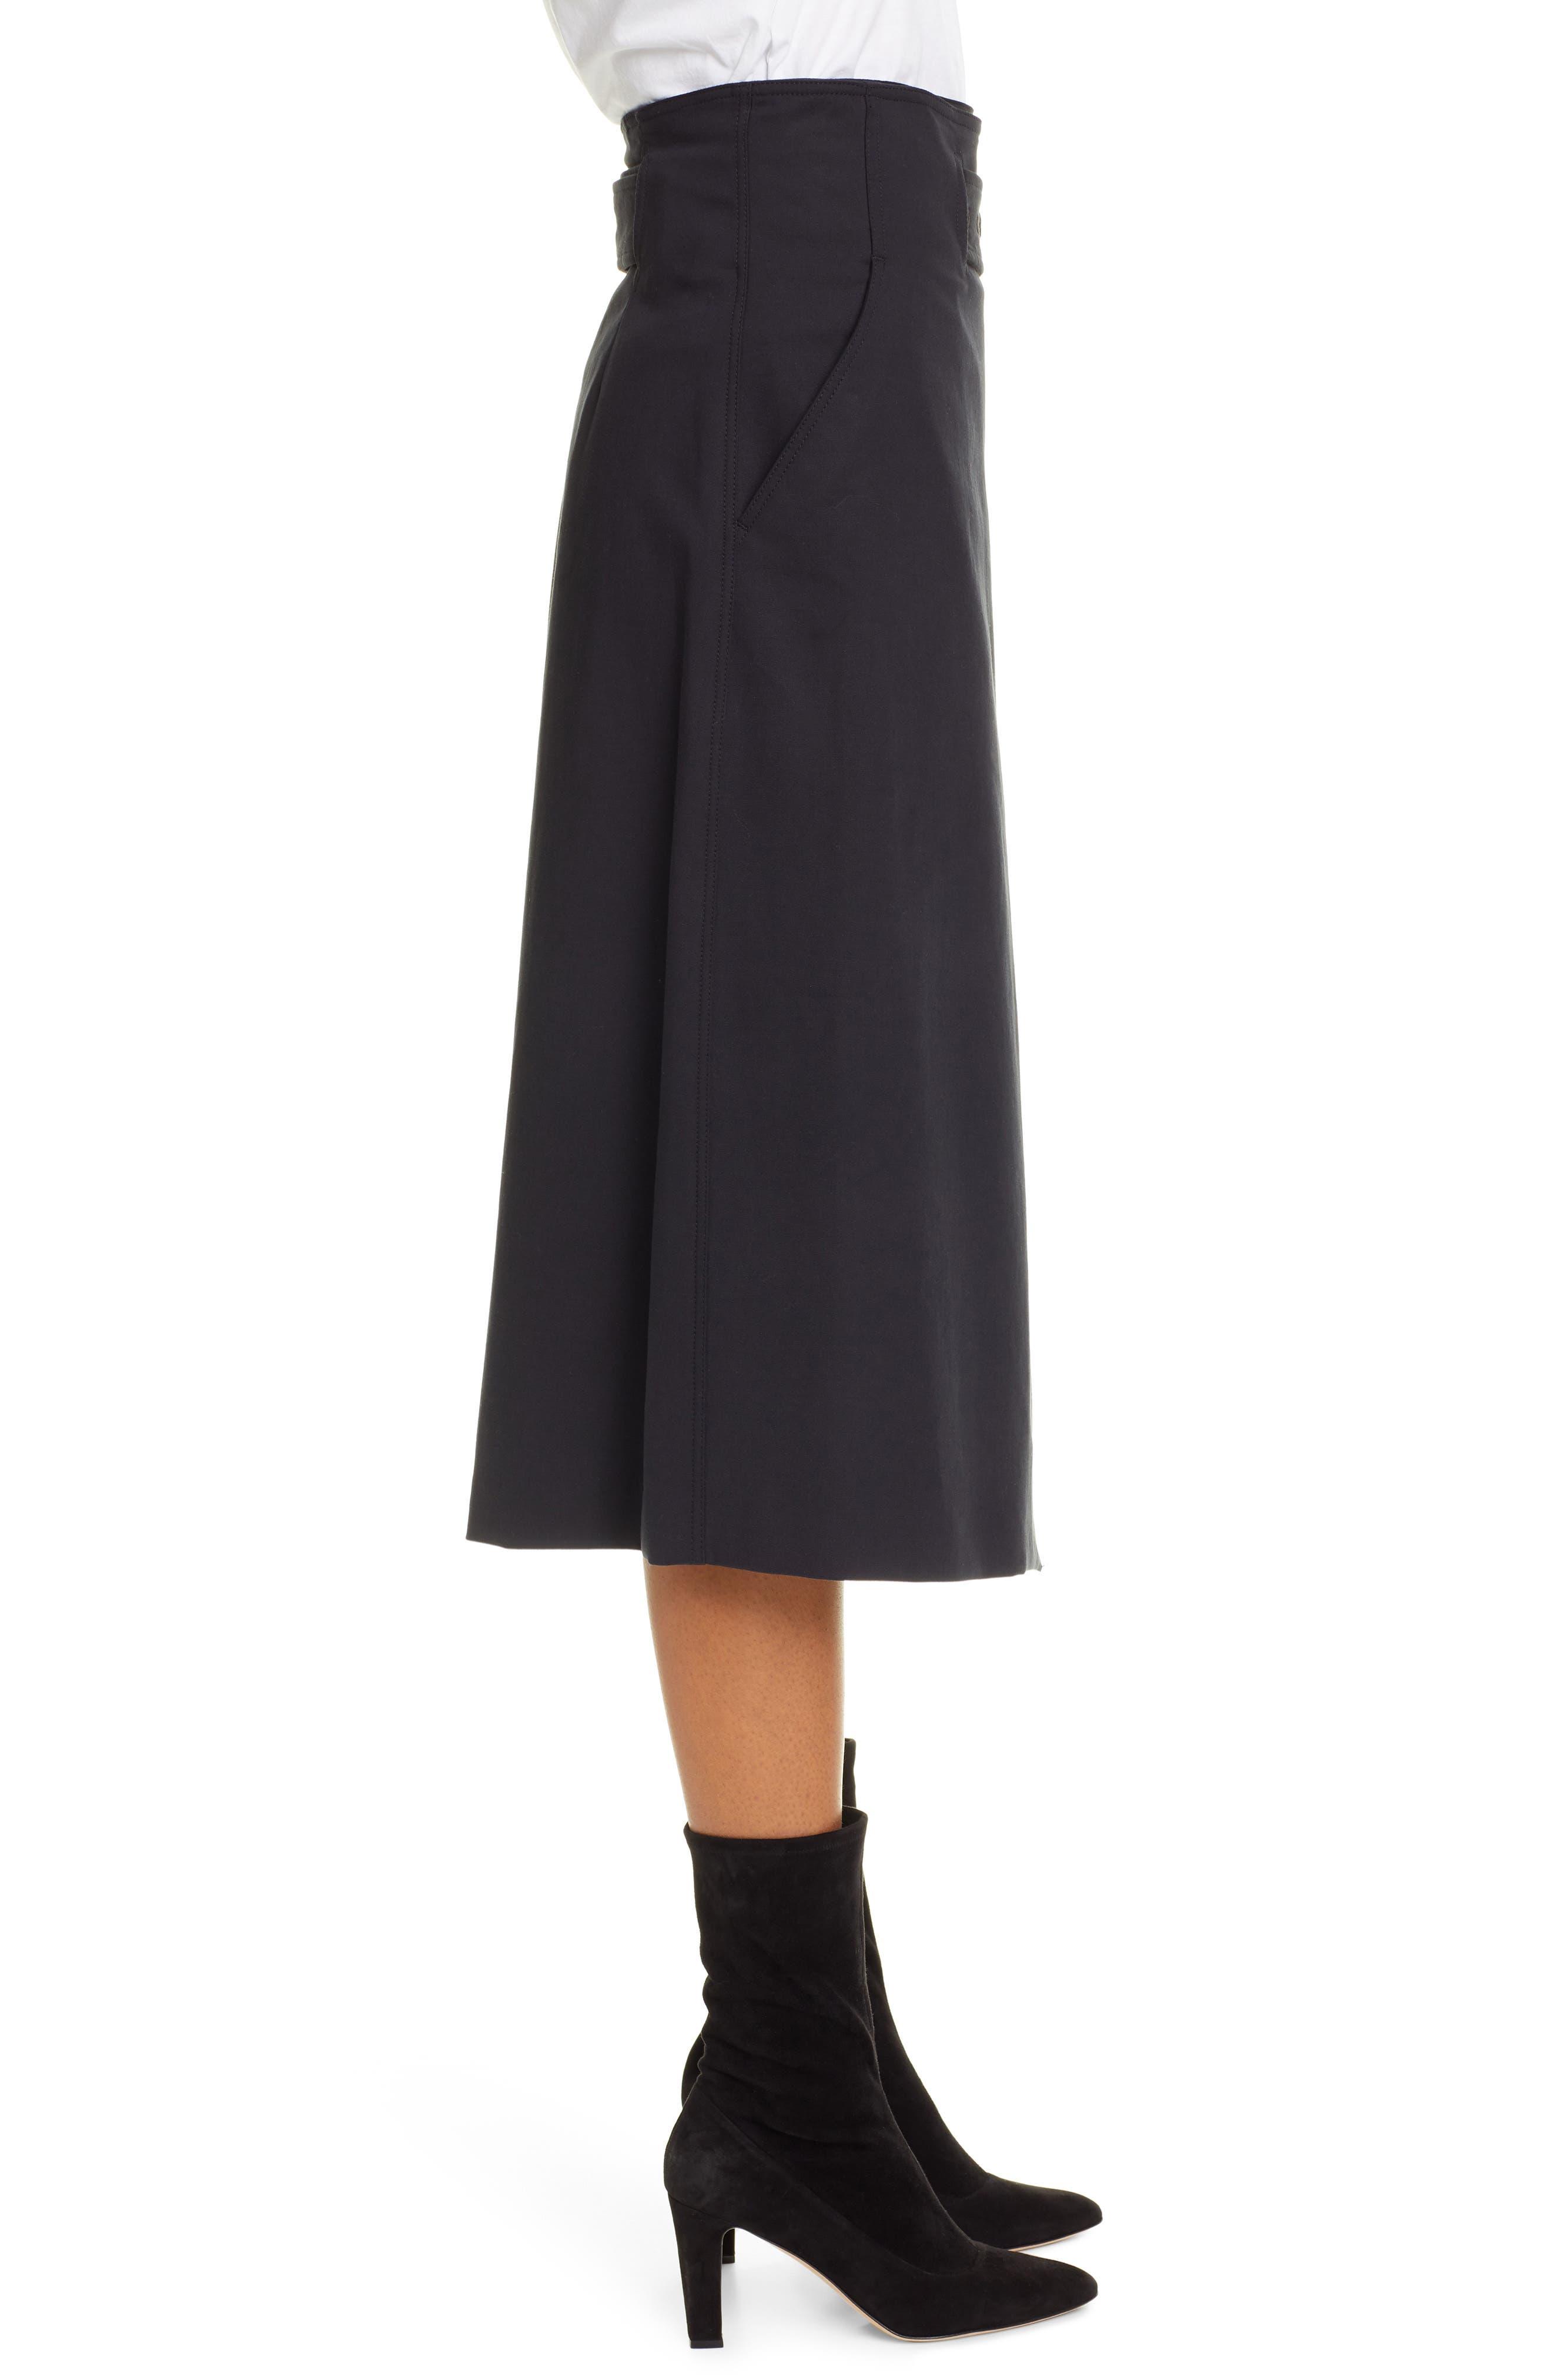 A.L.C., Aldridge Belted Midi Skirt, Alternate thumbnail 3, color, VINTAGE BLACK